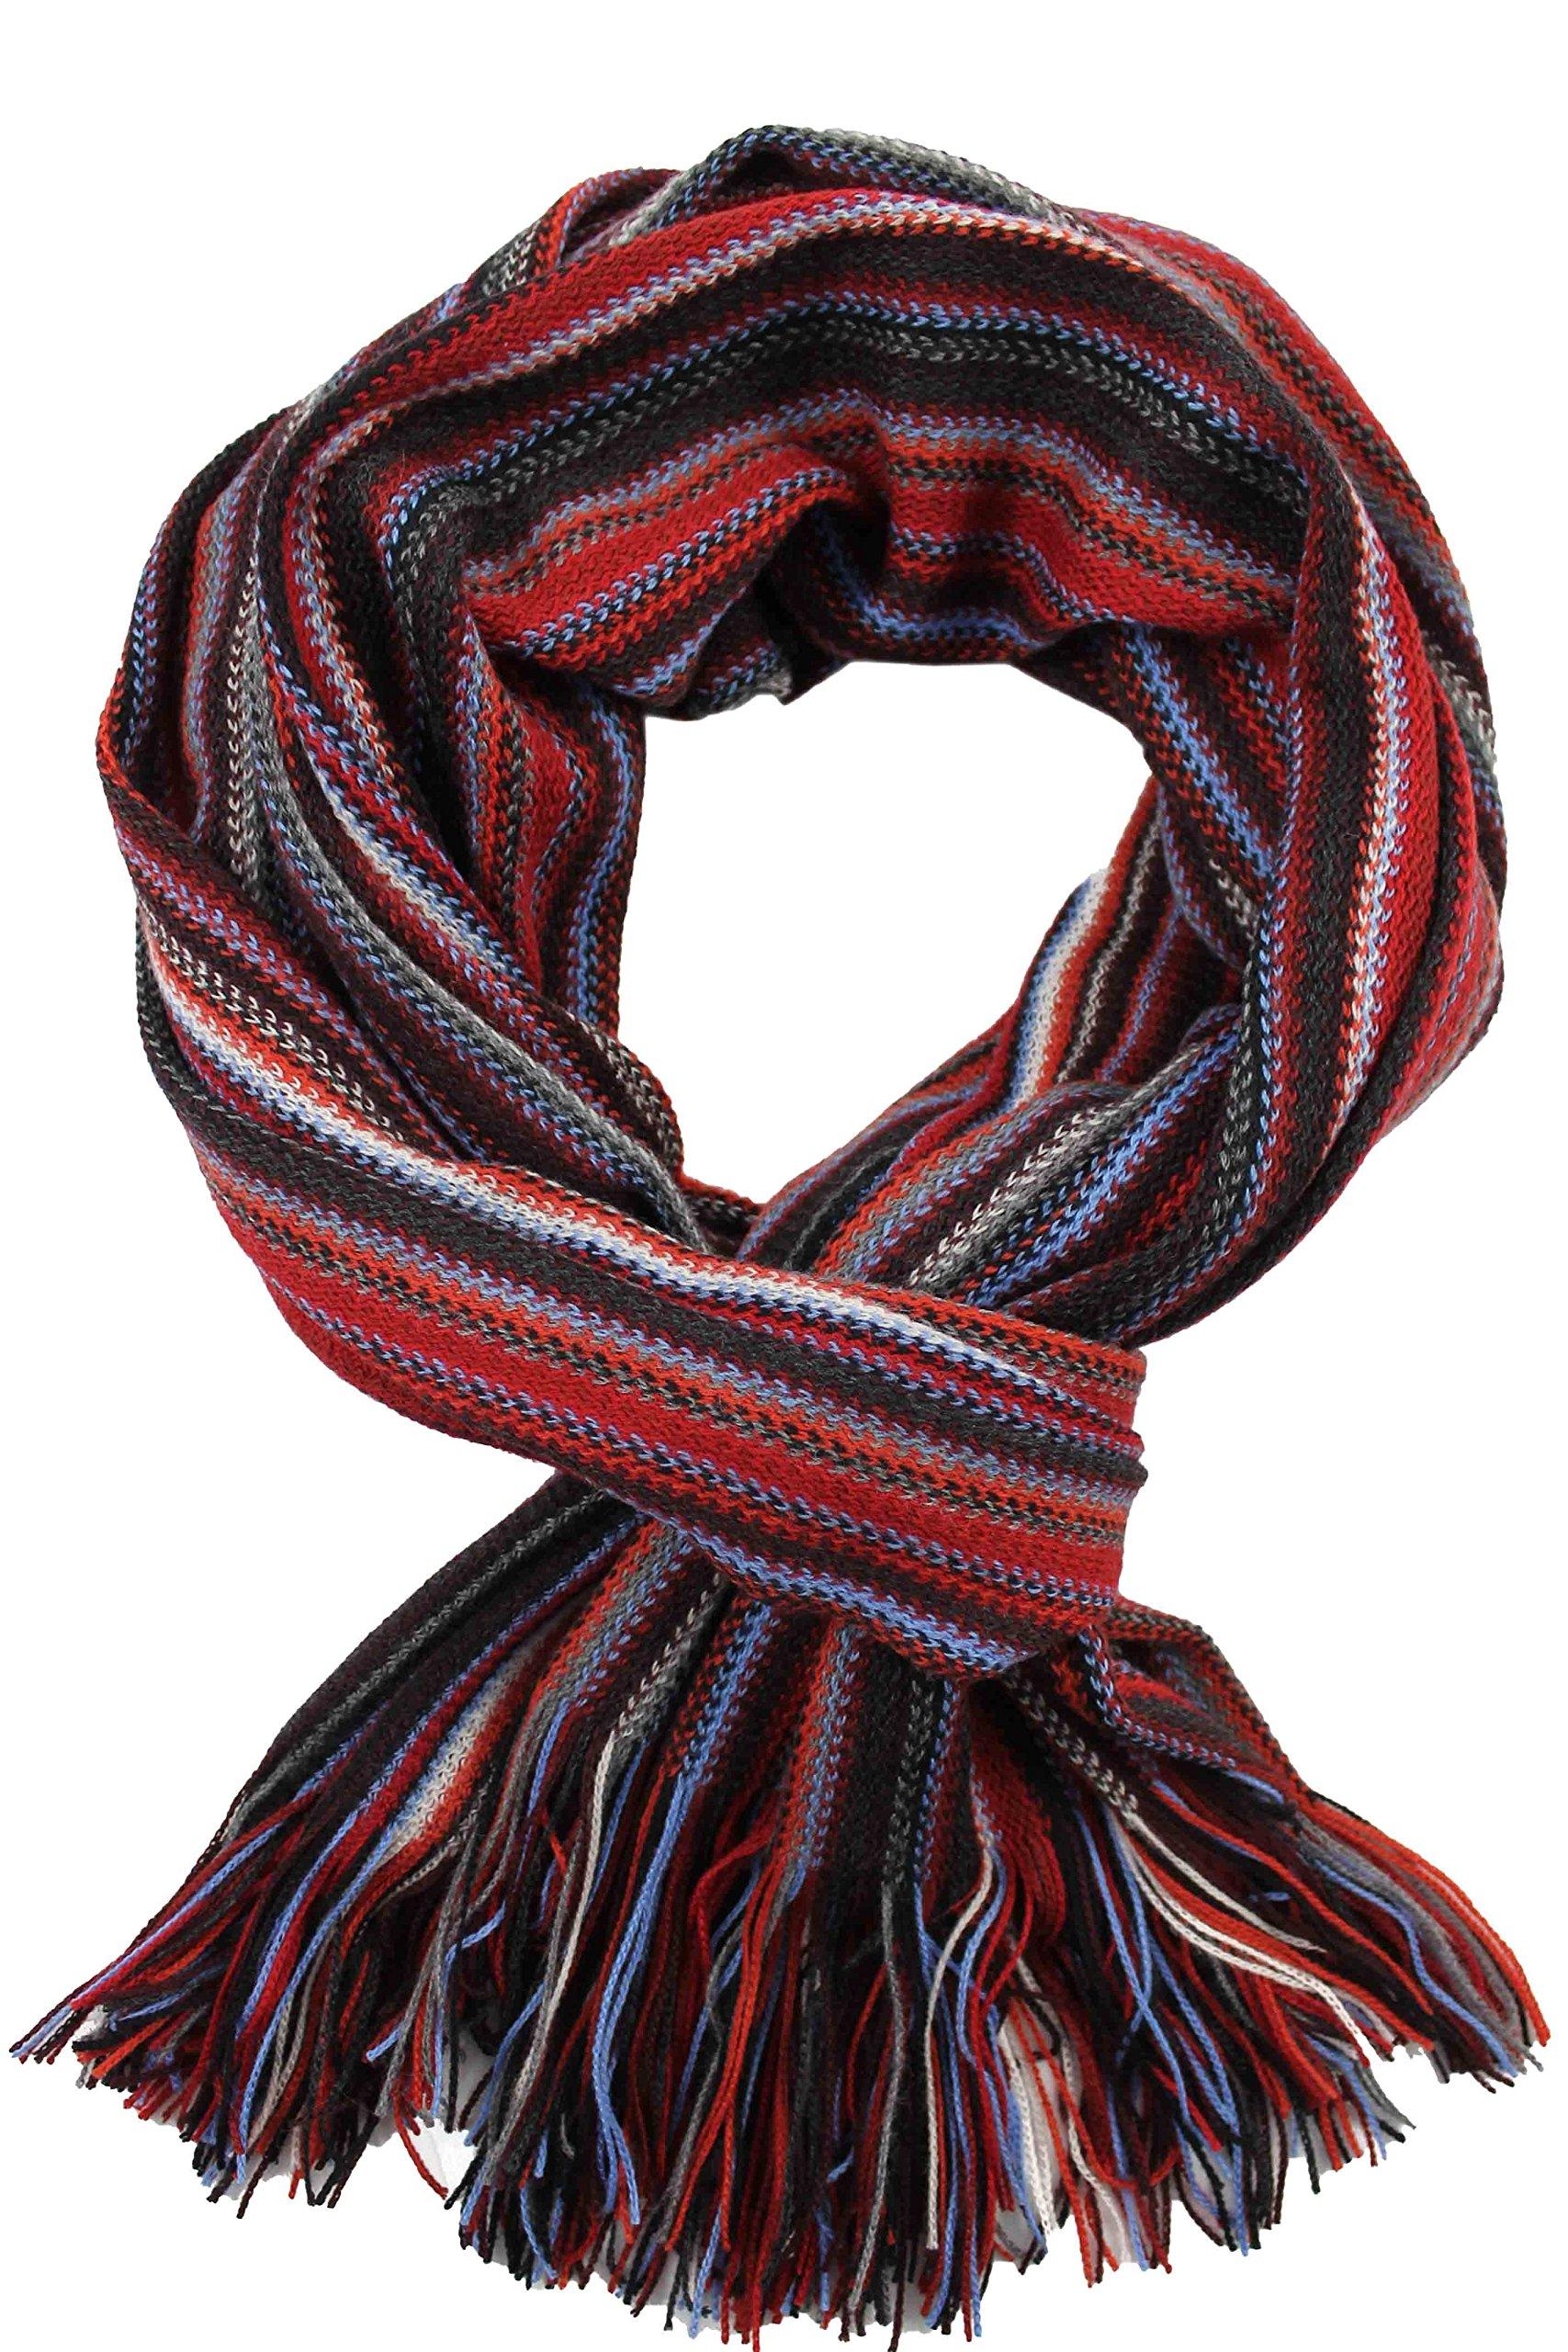 Scarf, striped, red - multicolor, 100% wool (Merino)